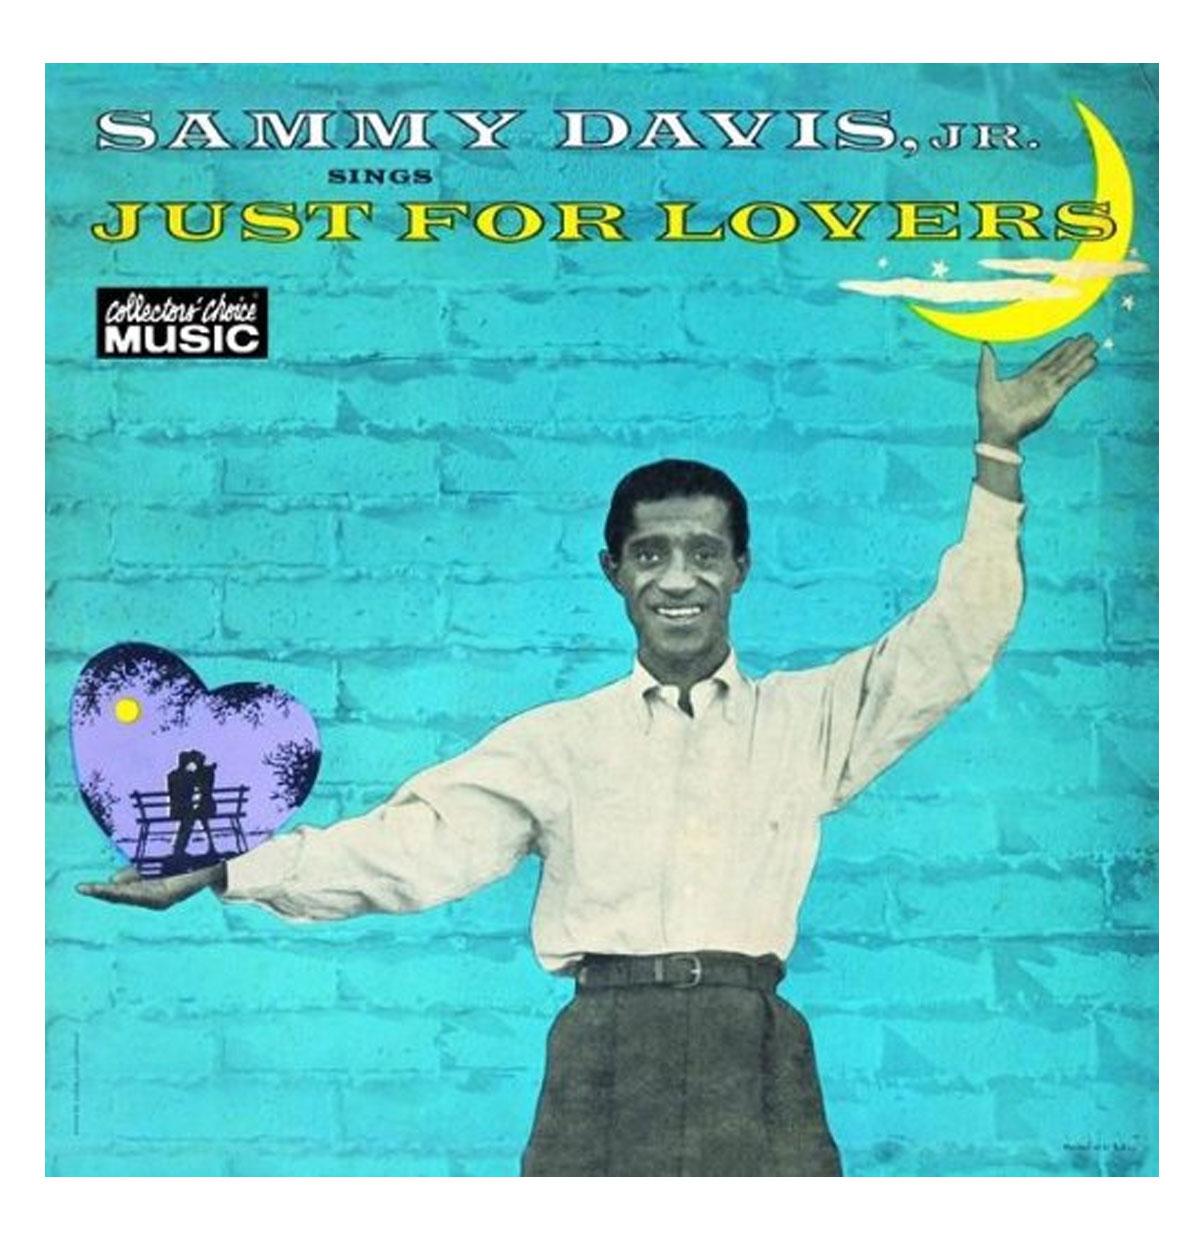 Sammy Davis Jr. - Just For Lovers LP